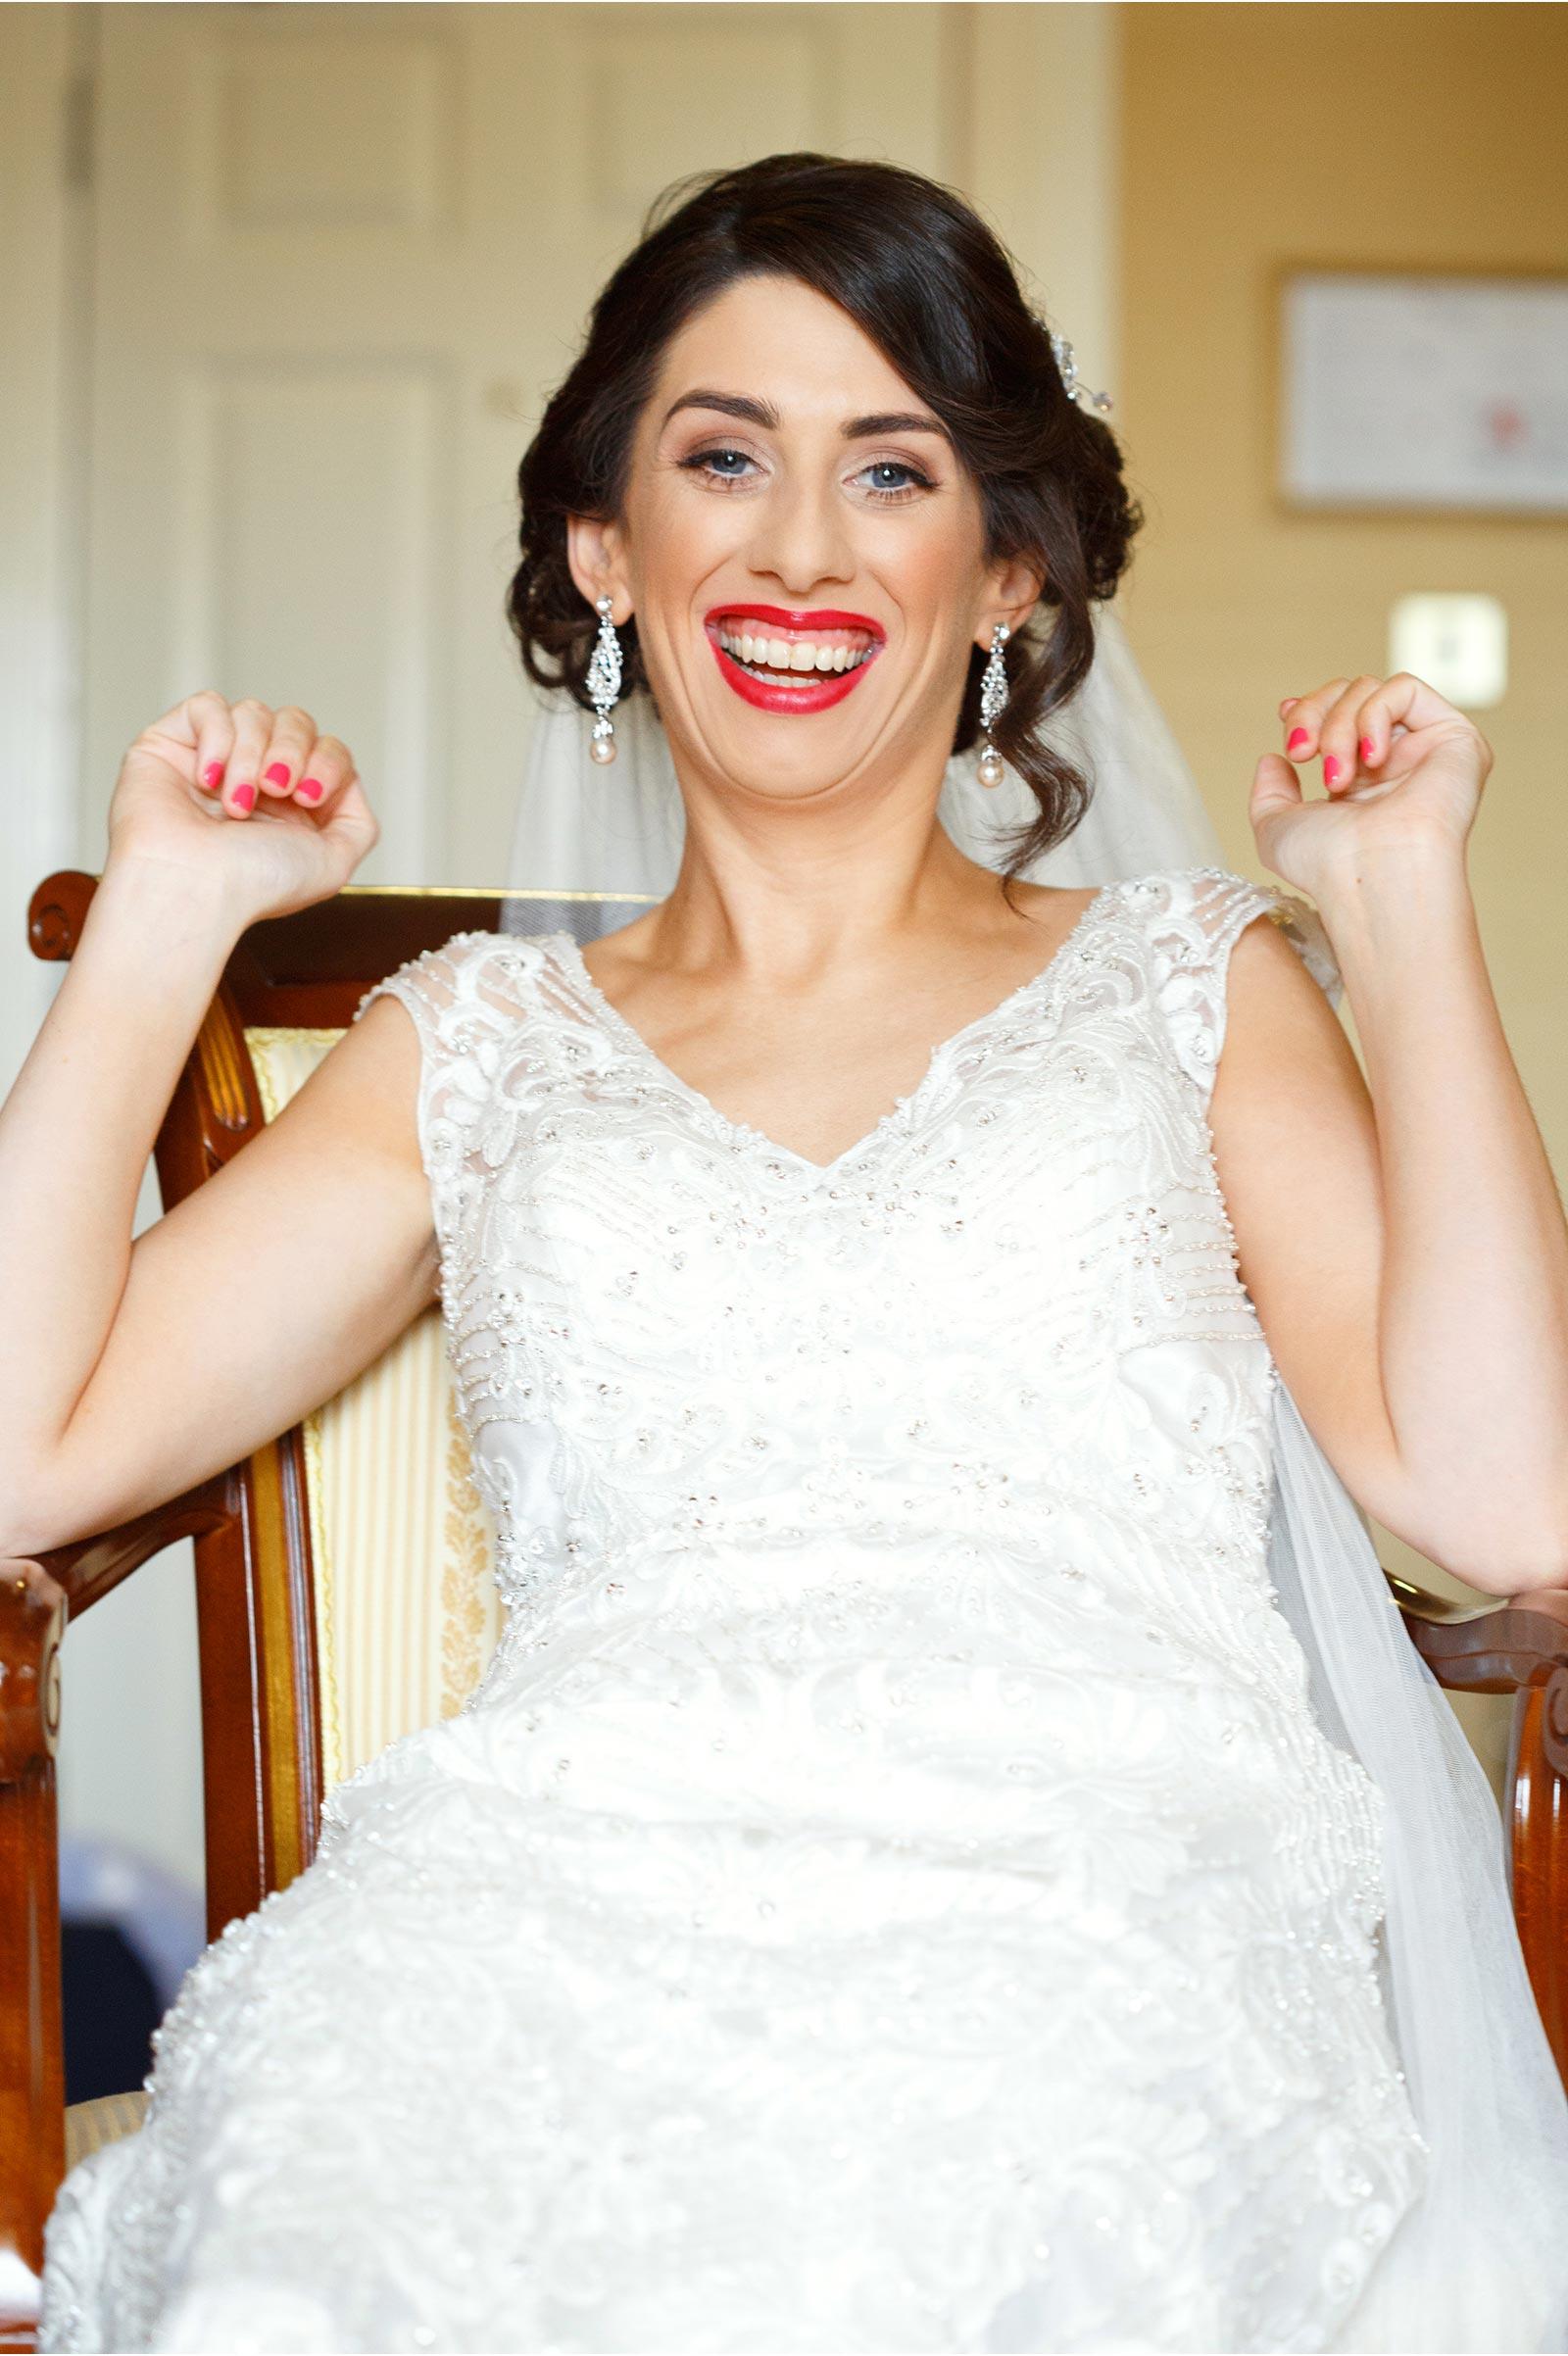 Happy bride laughing